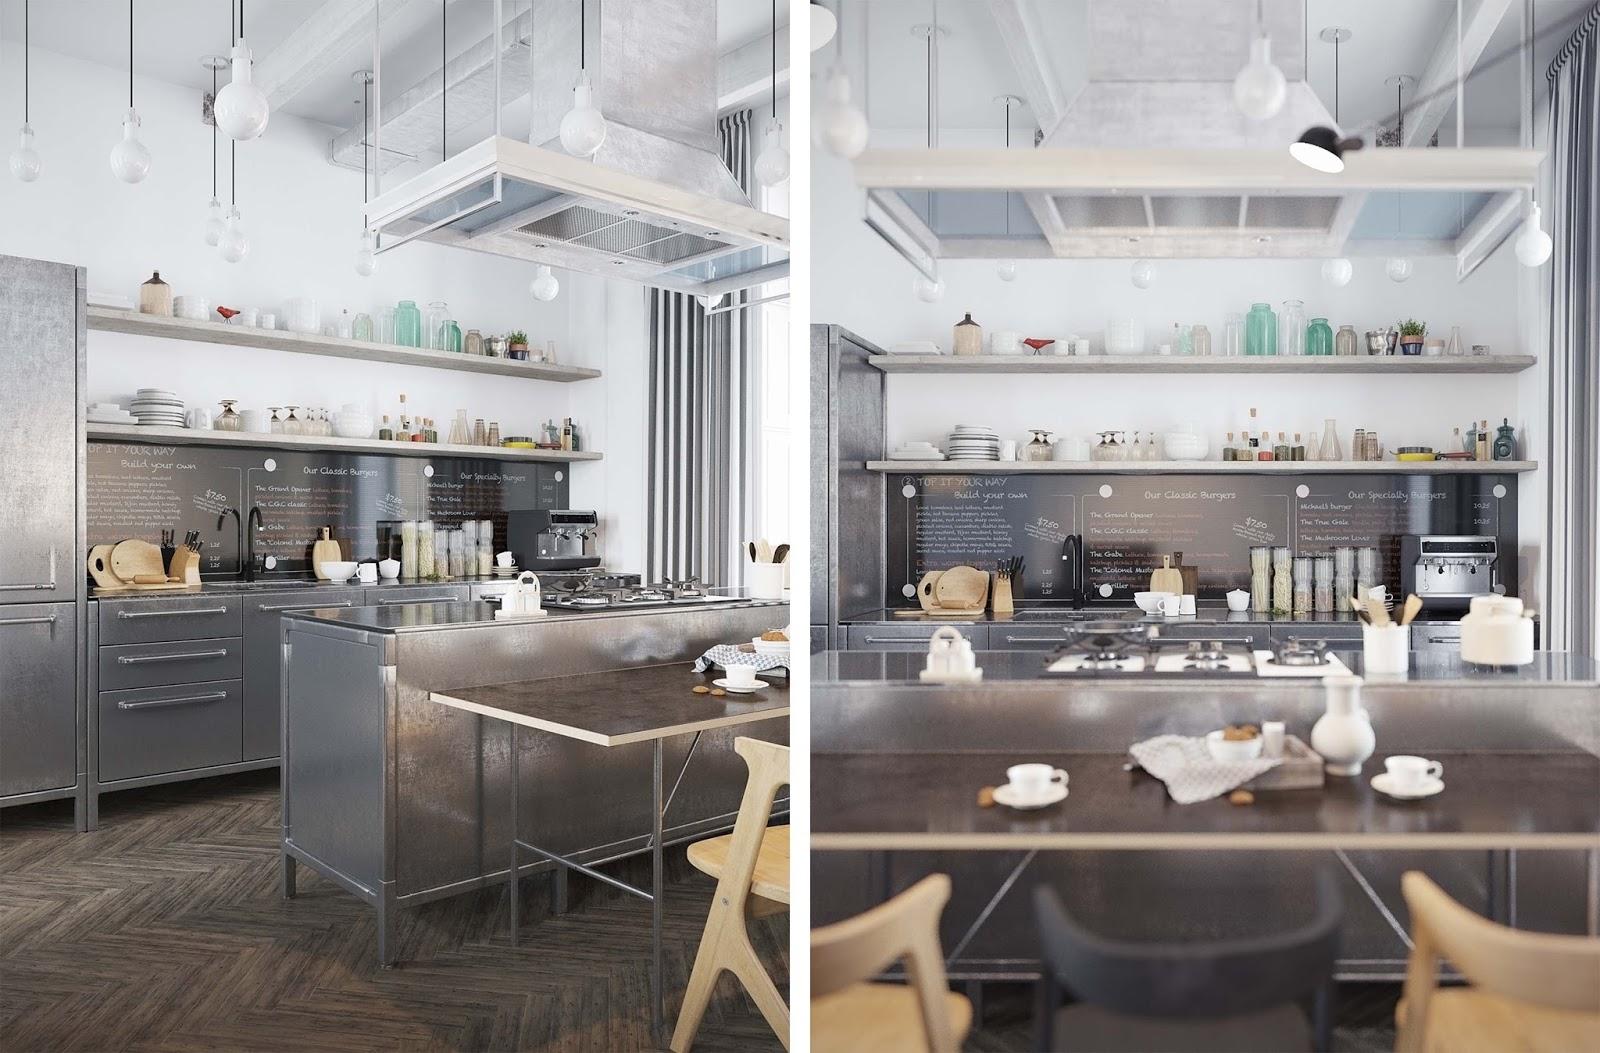 Appartamento stile industriale lr23 regardsdefemmes for Appartamento design industriale